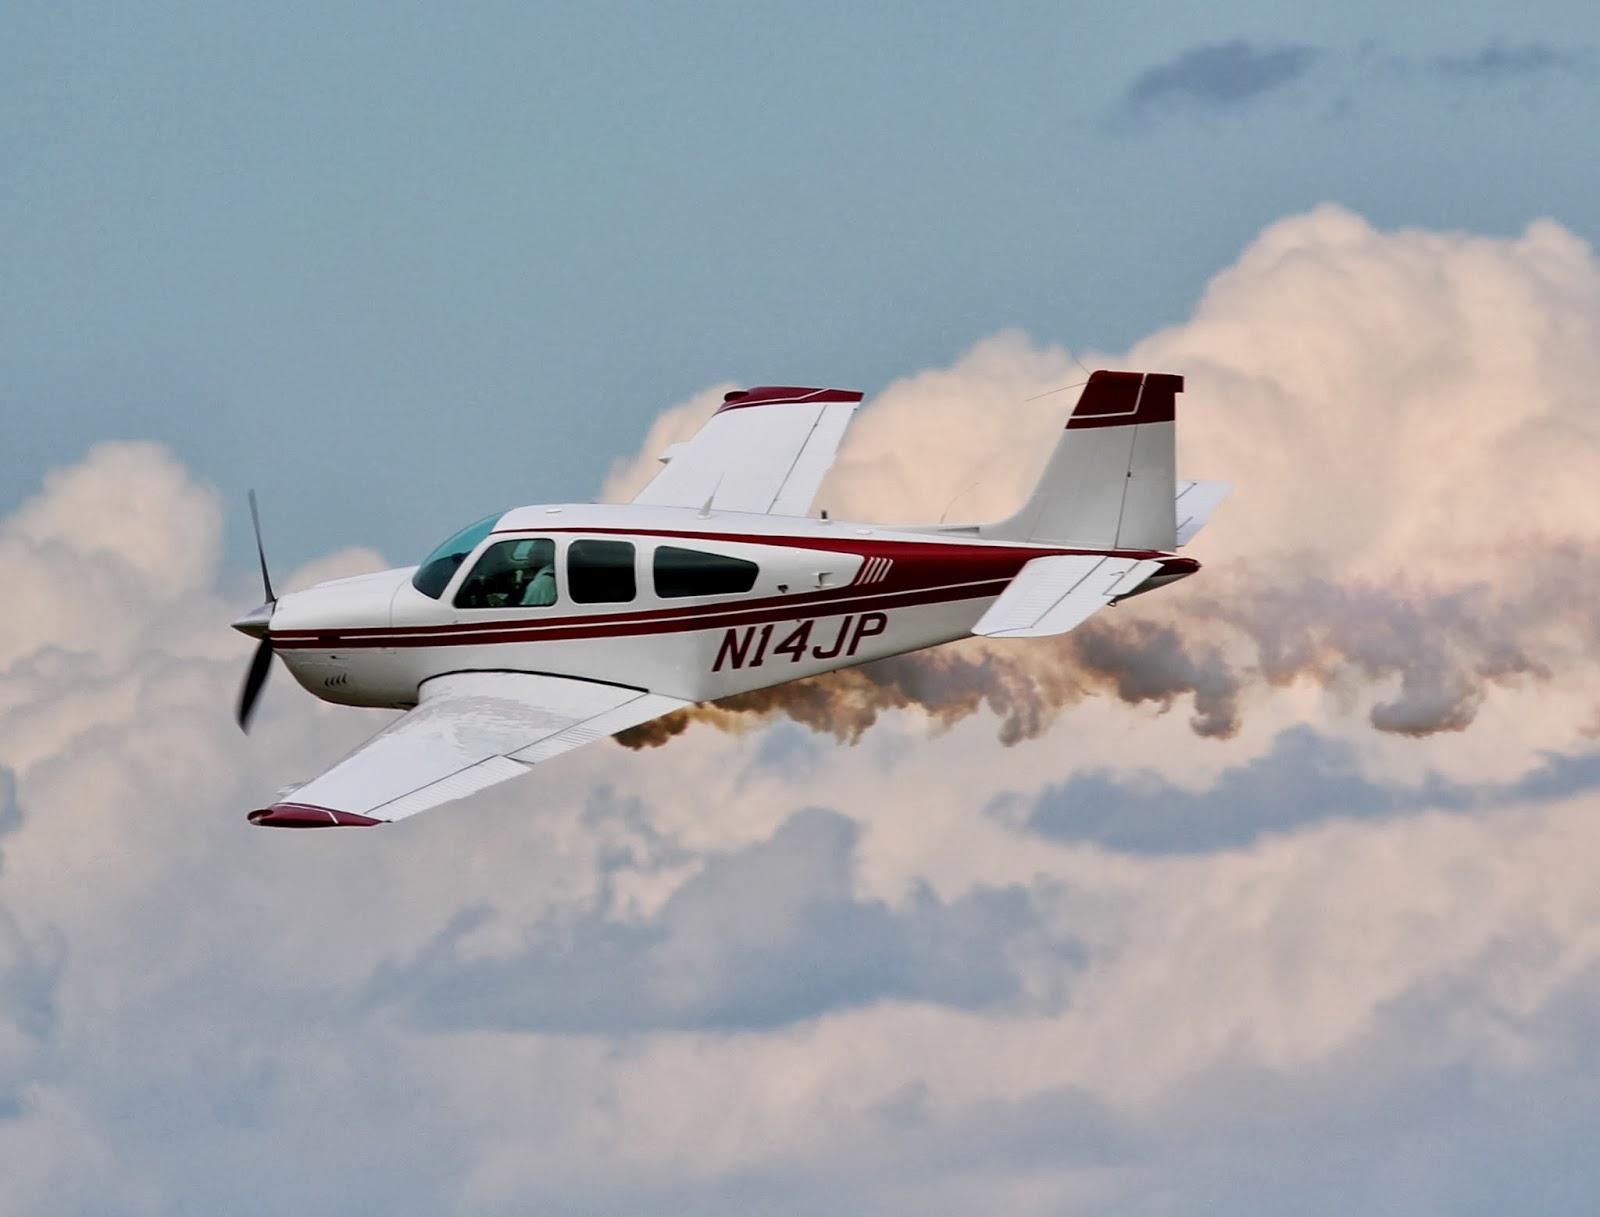 http://aeroexperience.blogspot.com/2014/02/eaa-airventure-oshkosh-2013-jim-peitz.html